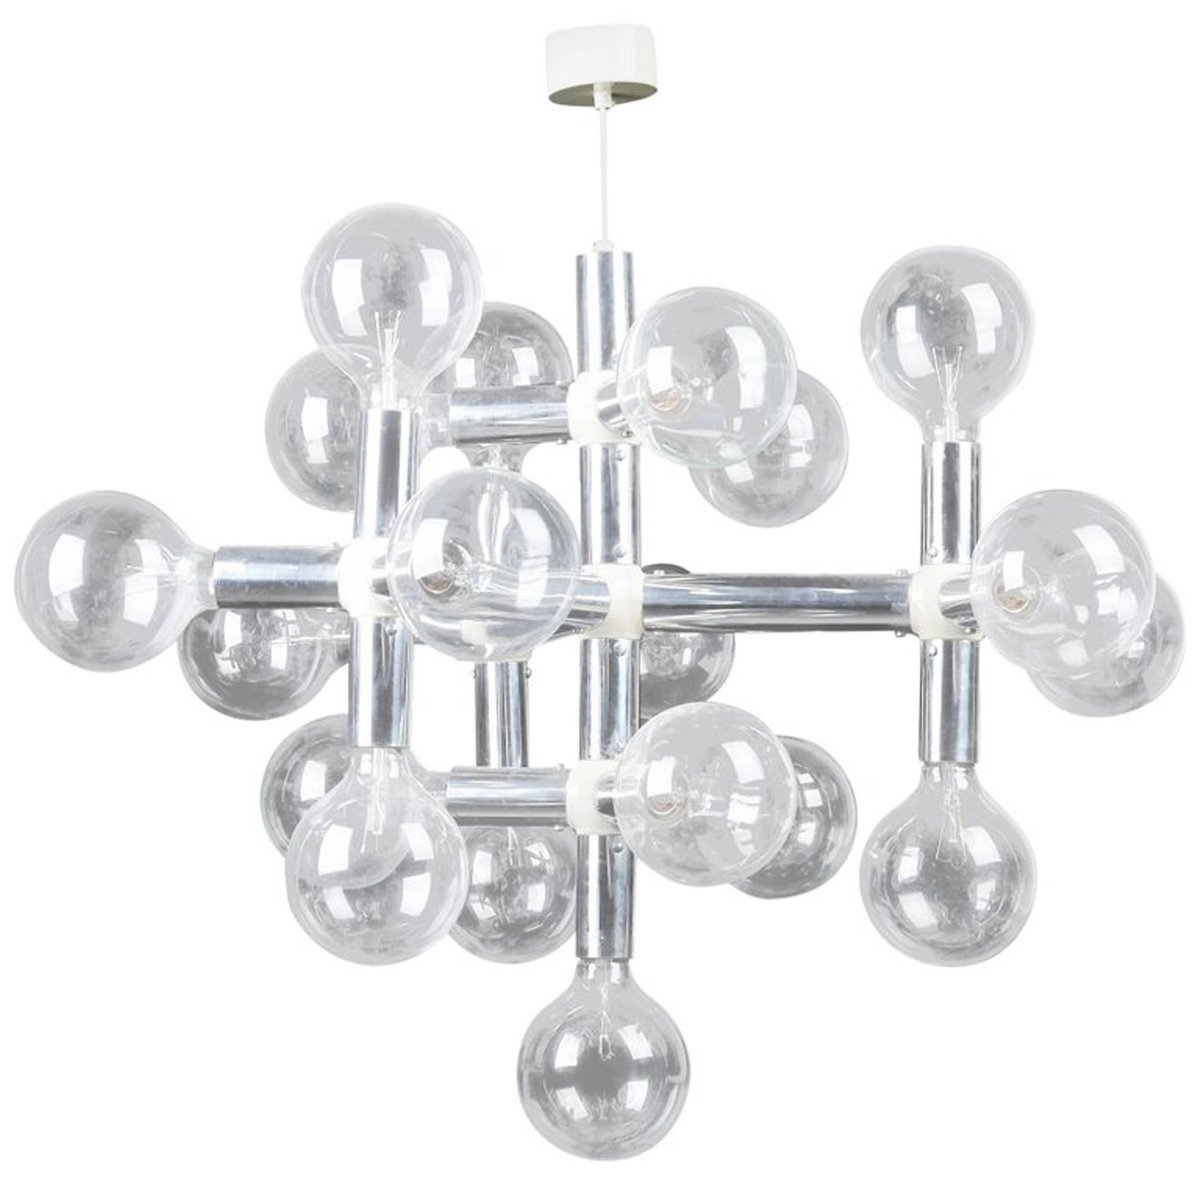 Atomic chandelier by robert haussmann for swiss lamps atomic chandelier by robert haussmann for swiss lamps international 1960s arubaitofo Choice Image